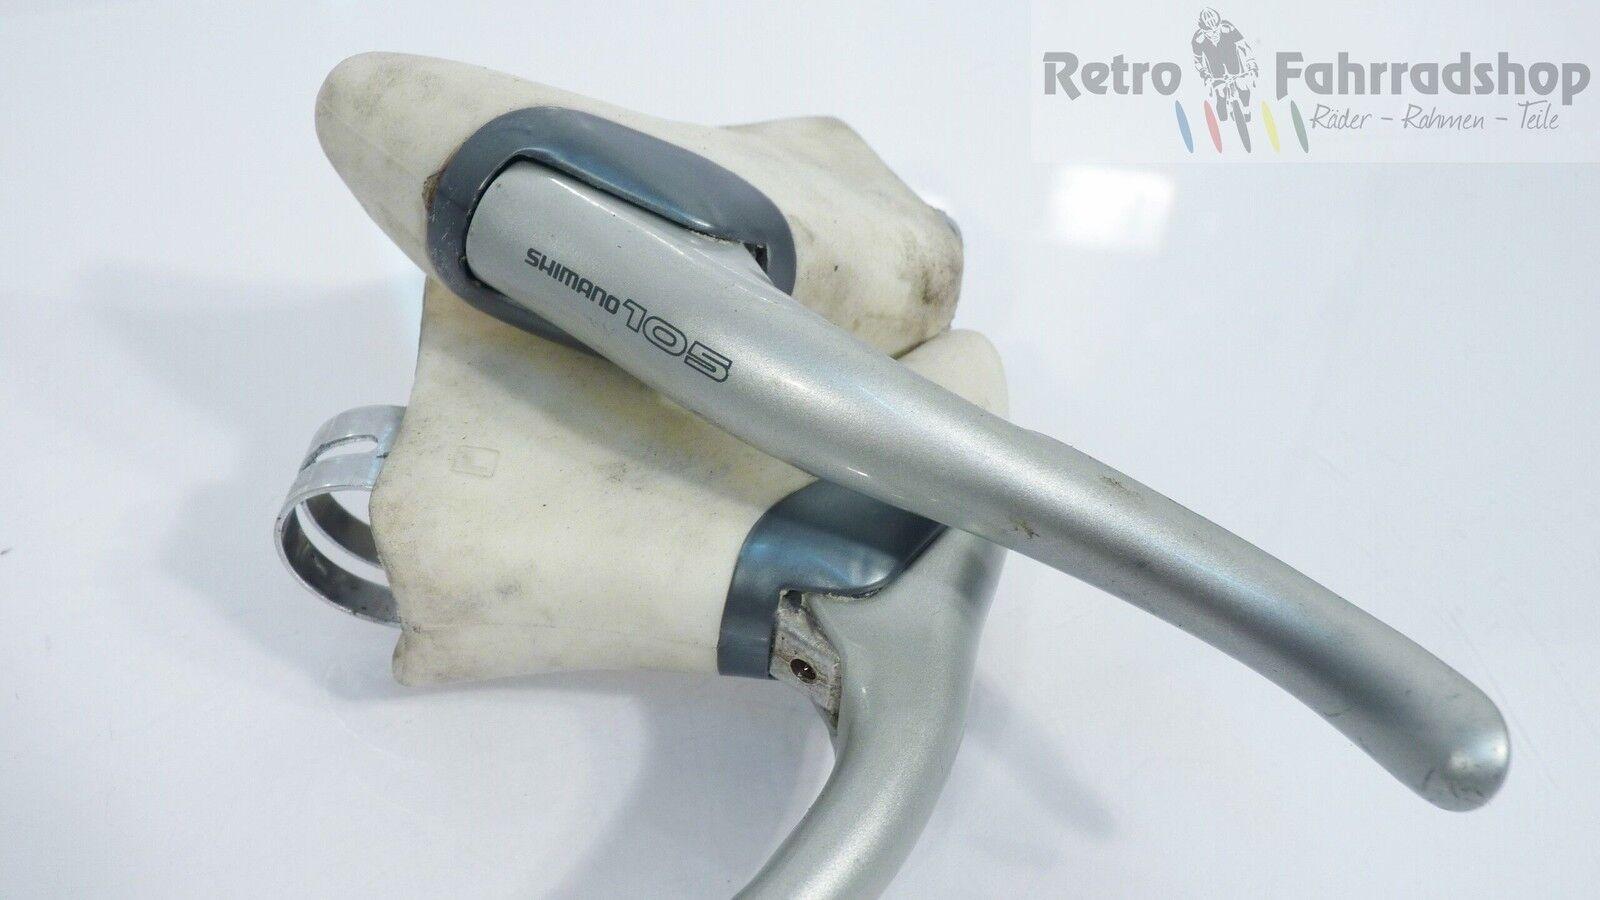 Shimano 105 BL-1055 Rennrad Cross Bremshebel FIXIE weiße Gummis RAR 254g